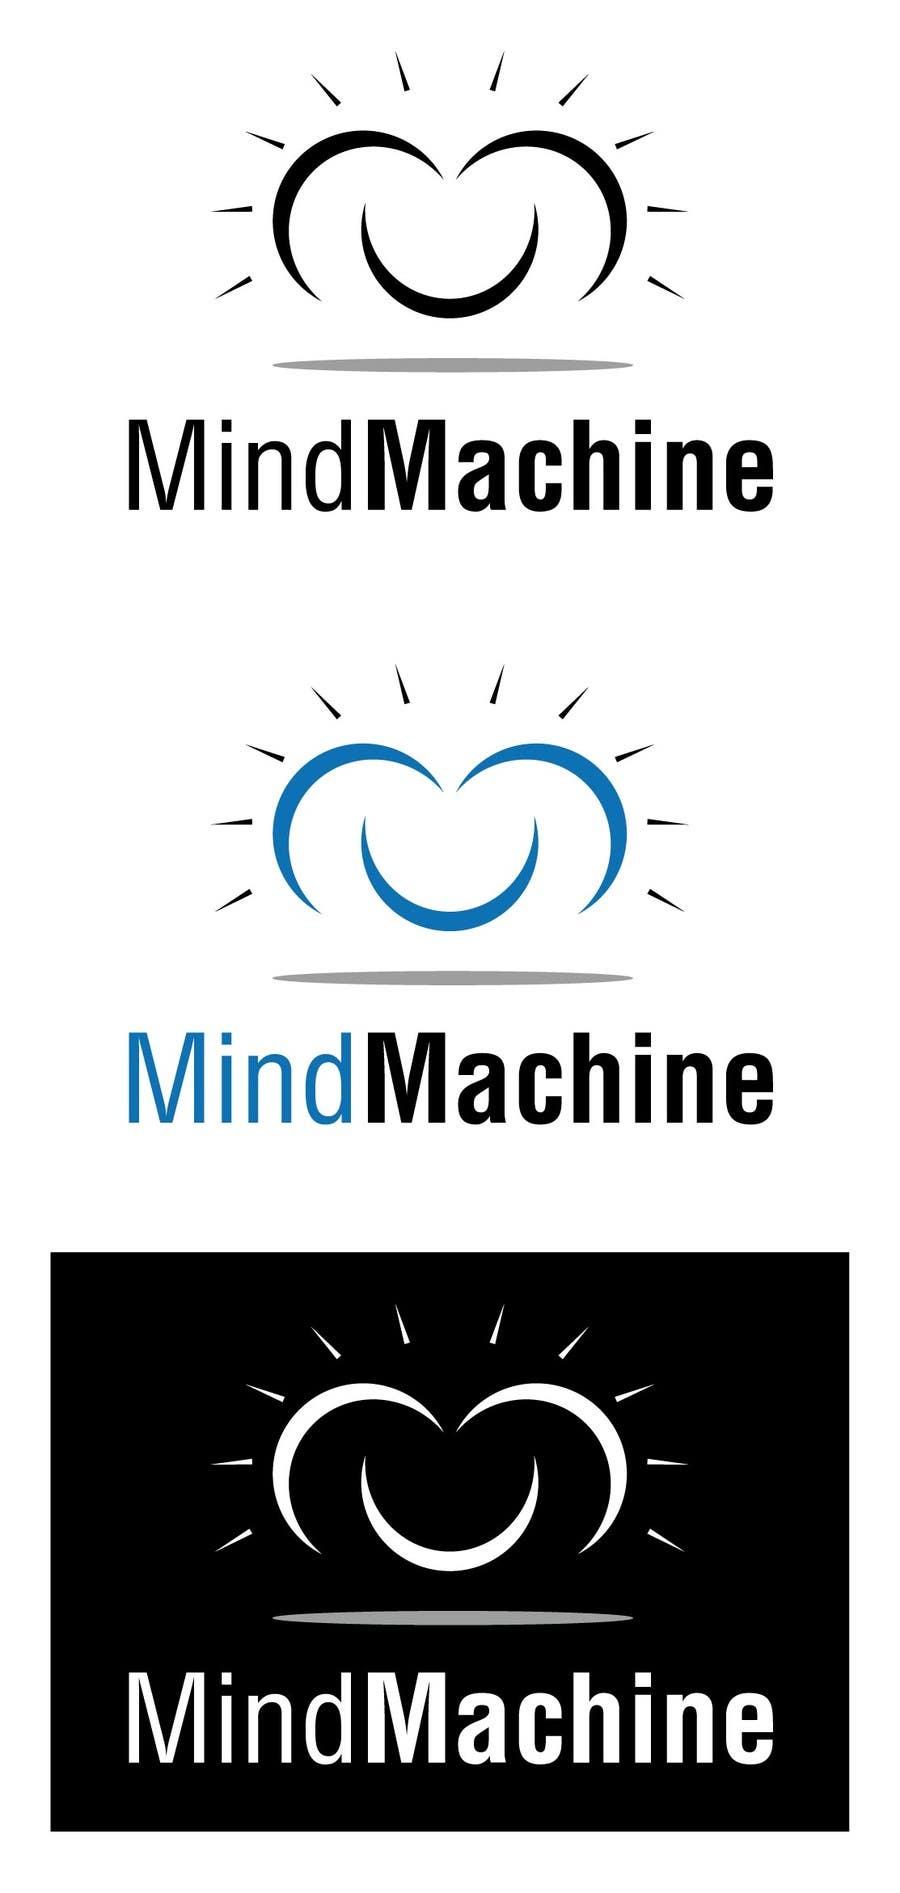 Bài tham dự cuộc thi #                                        12                                      cho                                         Logo Design for Mind Machine